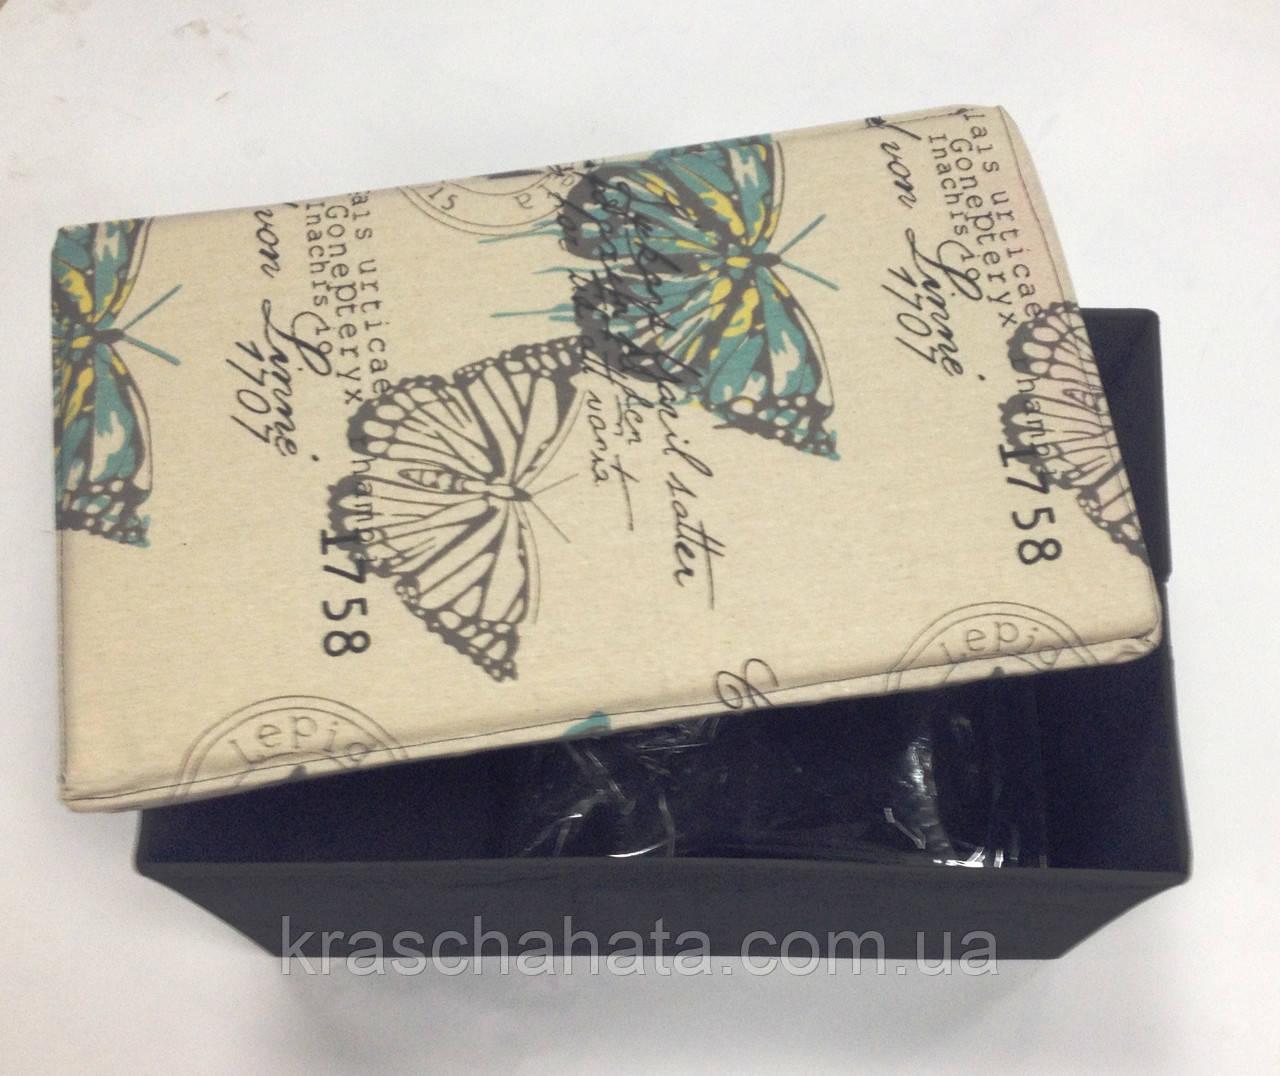 Текстильная коробка для хранения, 30х48х30 см, Декор для дома, Днепропетровск